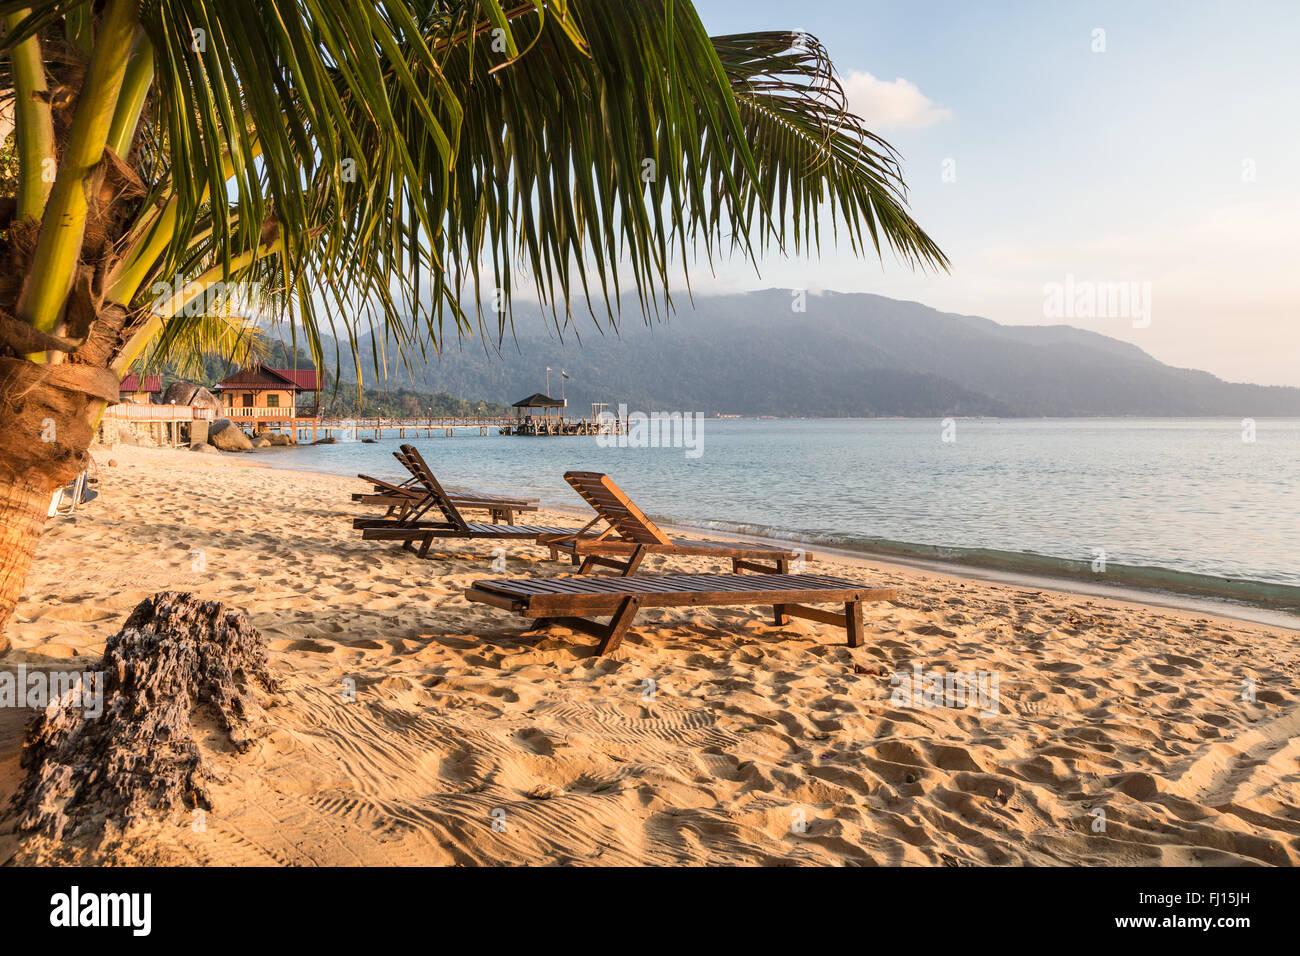 Long chairs on a beach in Pulau Tioman, Malaysia - Stock Image